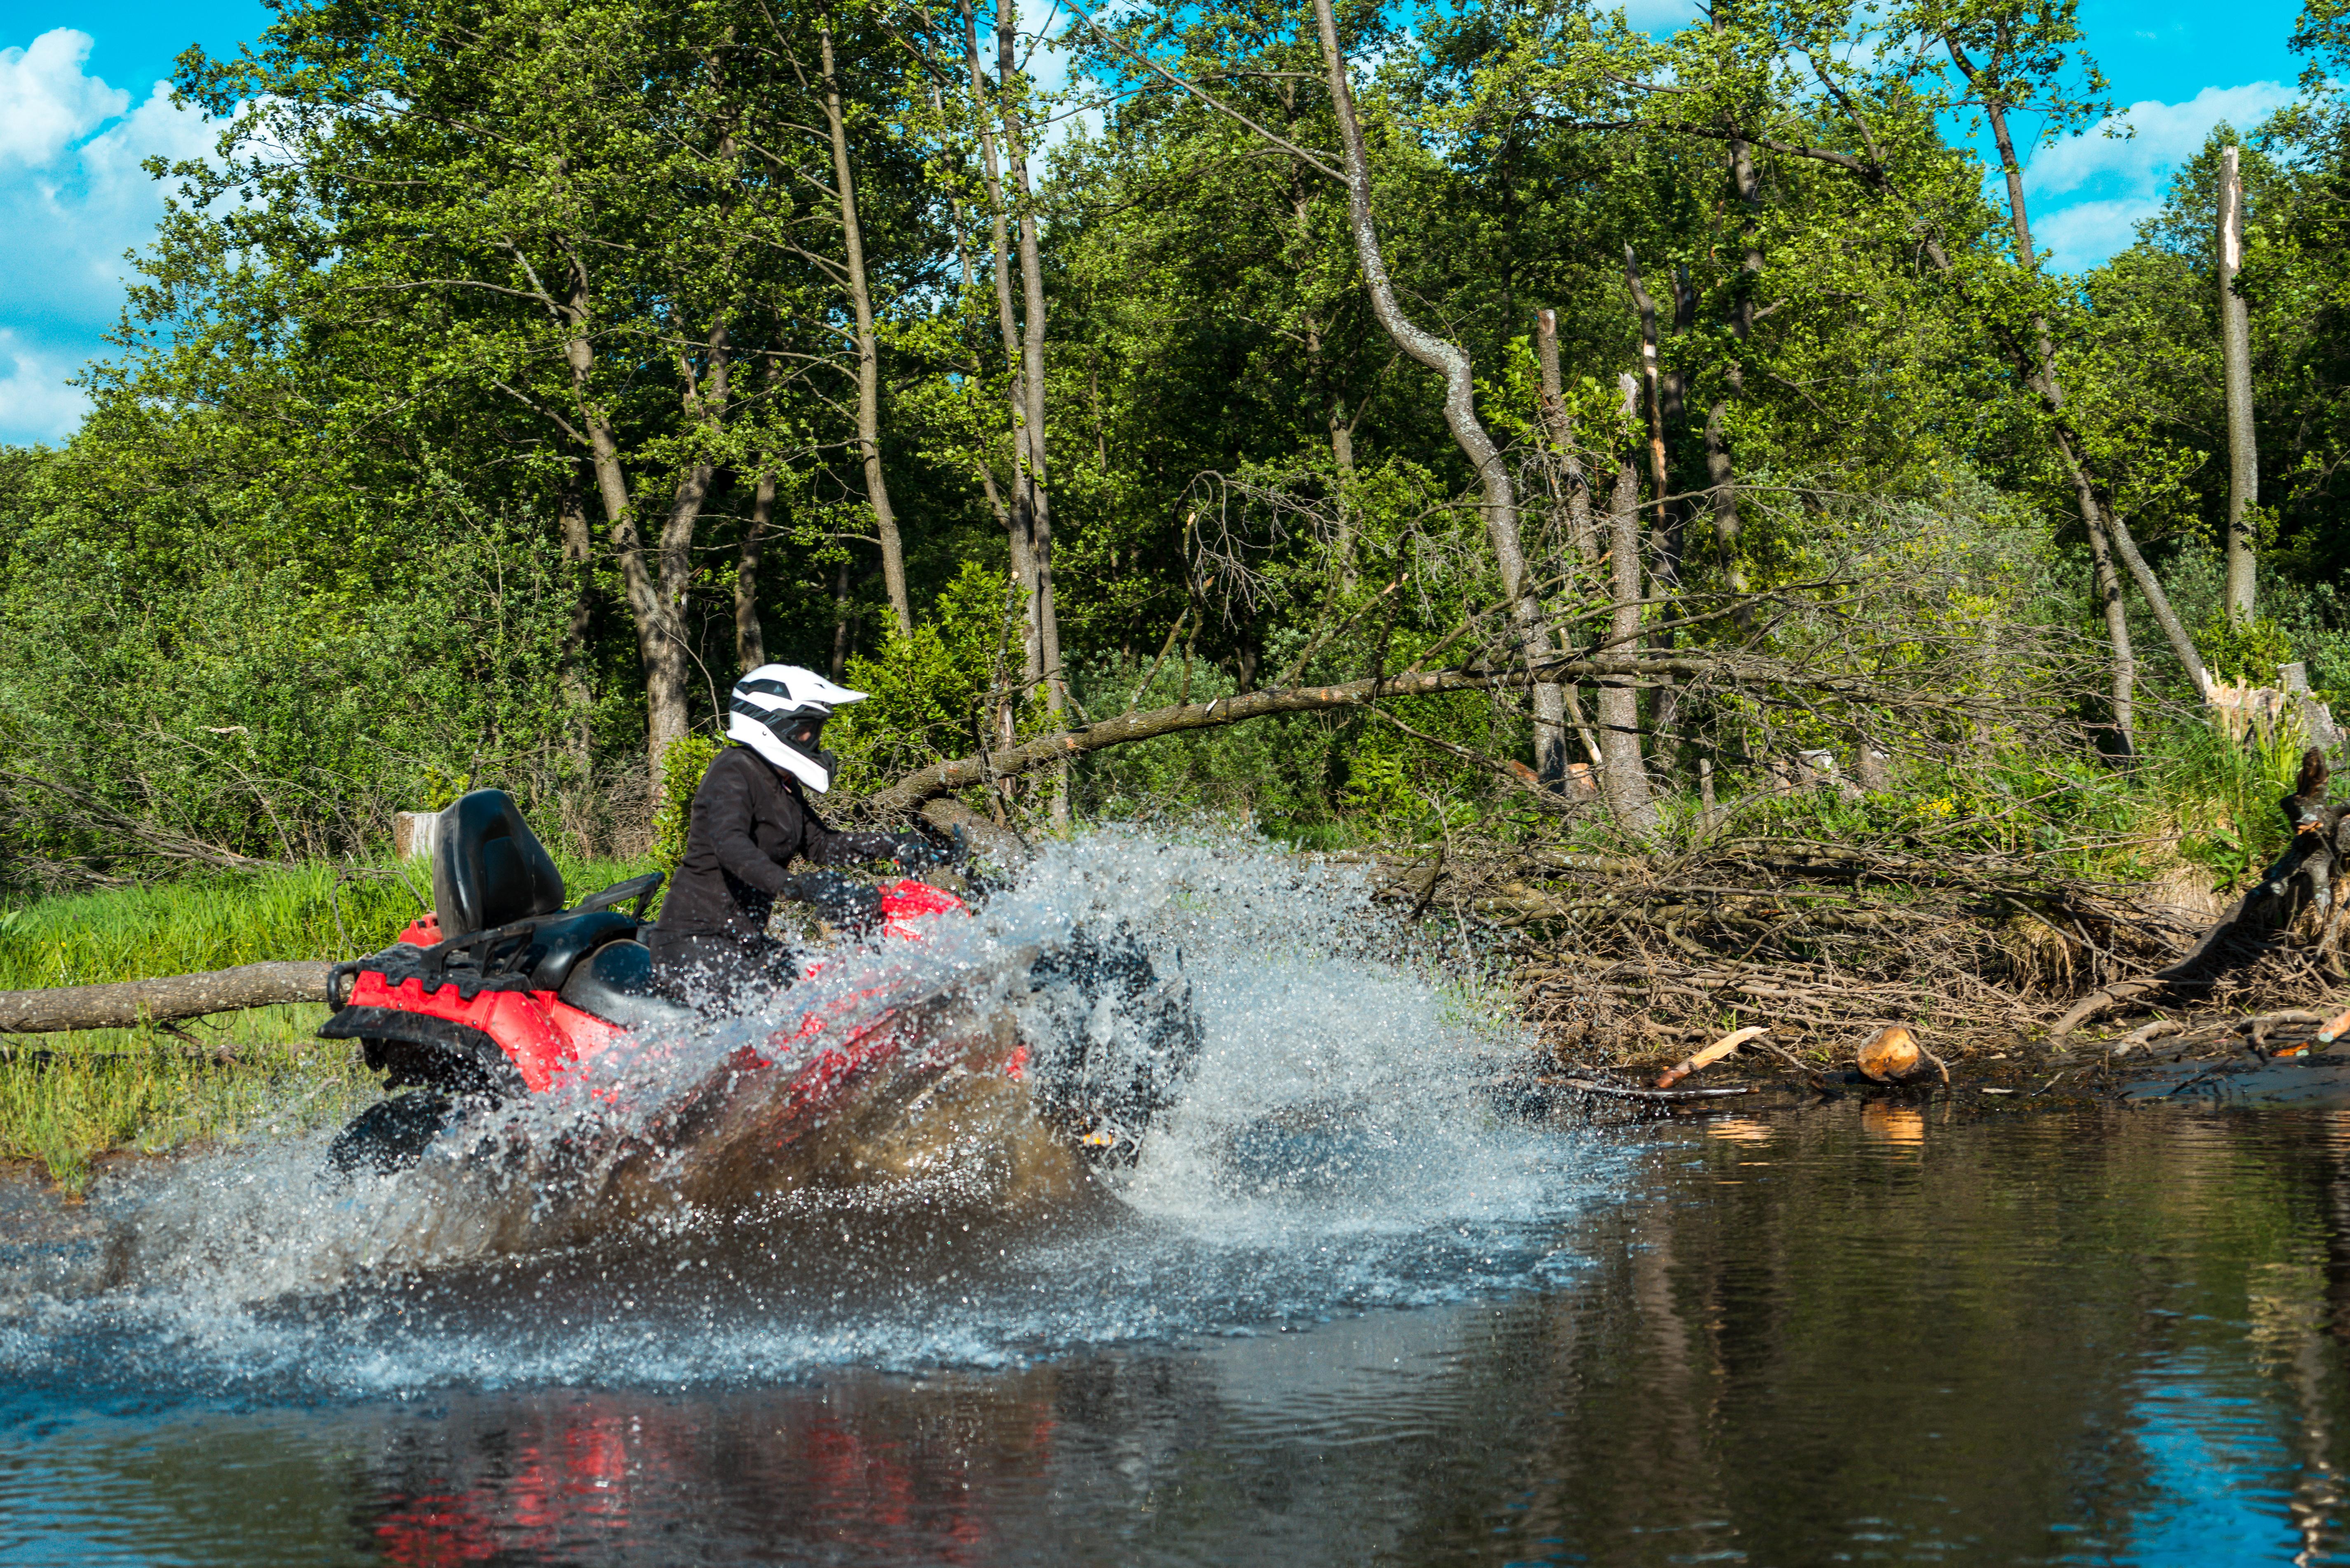 ATV rider fords a stream.